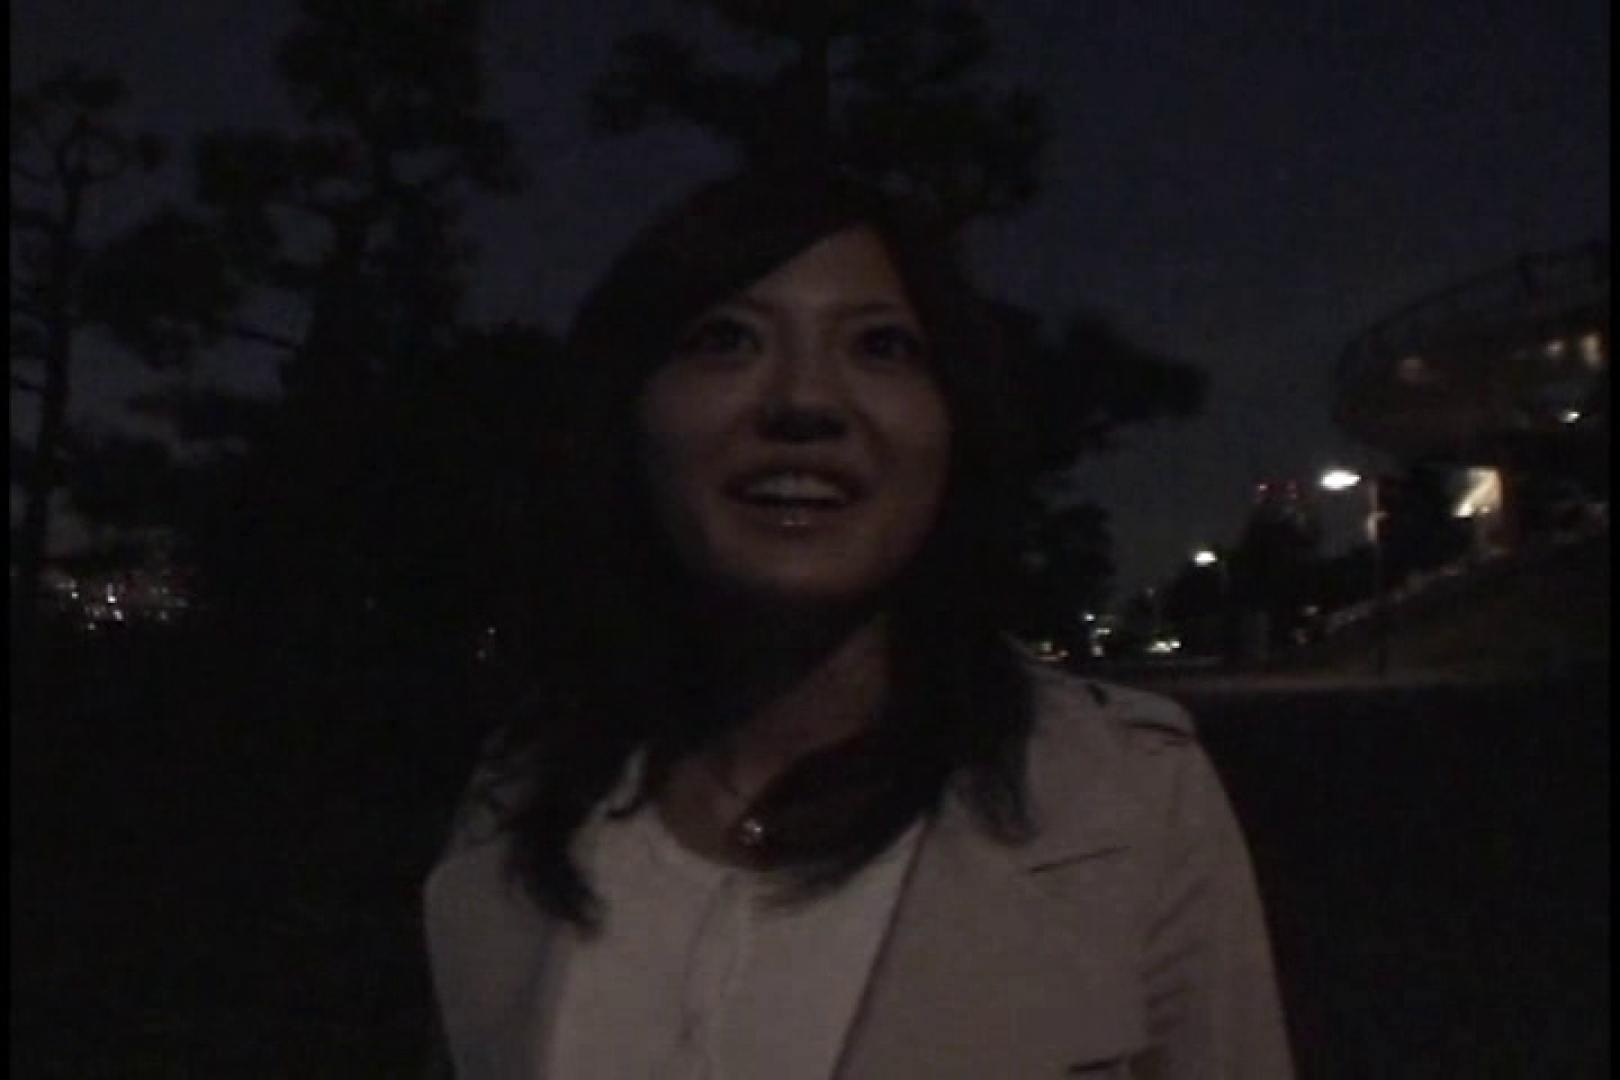 JDハンター全国ツアー vol.035 後編 OL女体  68連発 18